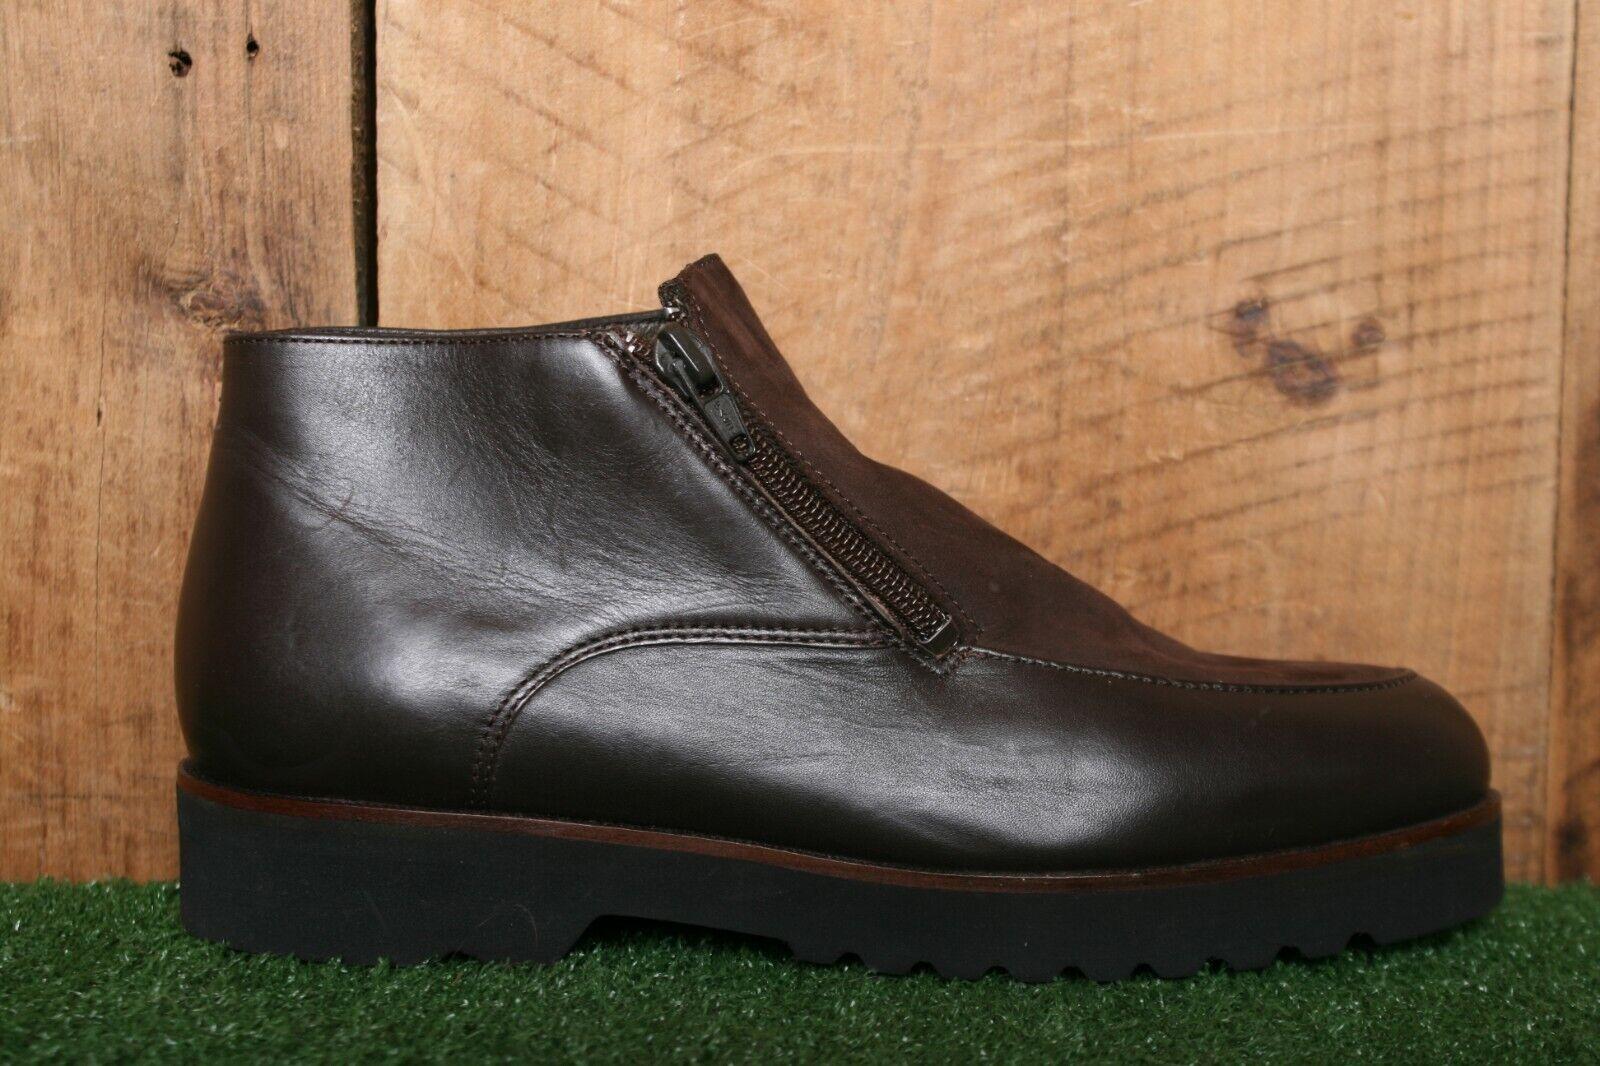 L.L. BEAN Brown Leather & Nubuck Side Zip Mid Ankle Boots Women's Sz. 7.5 M